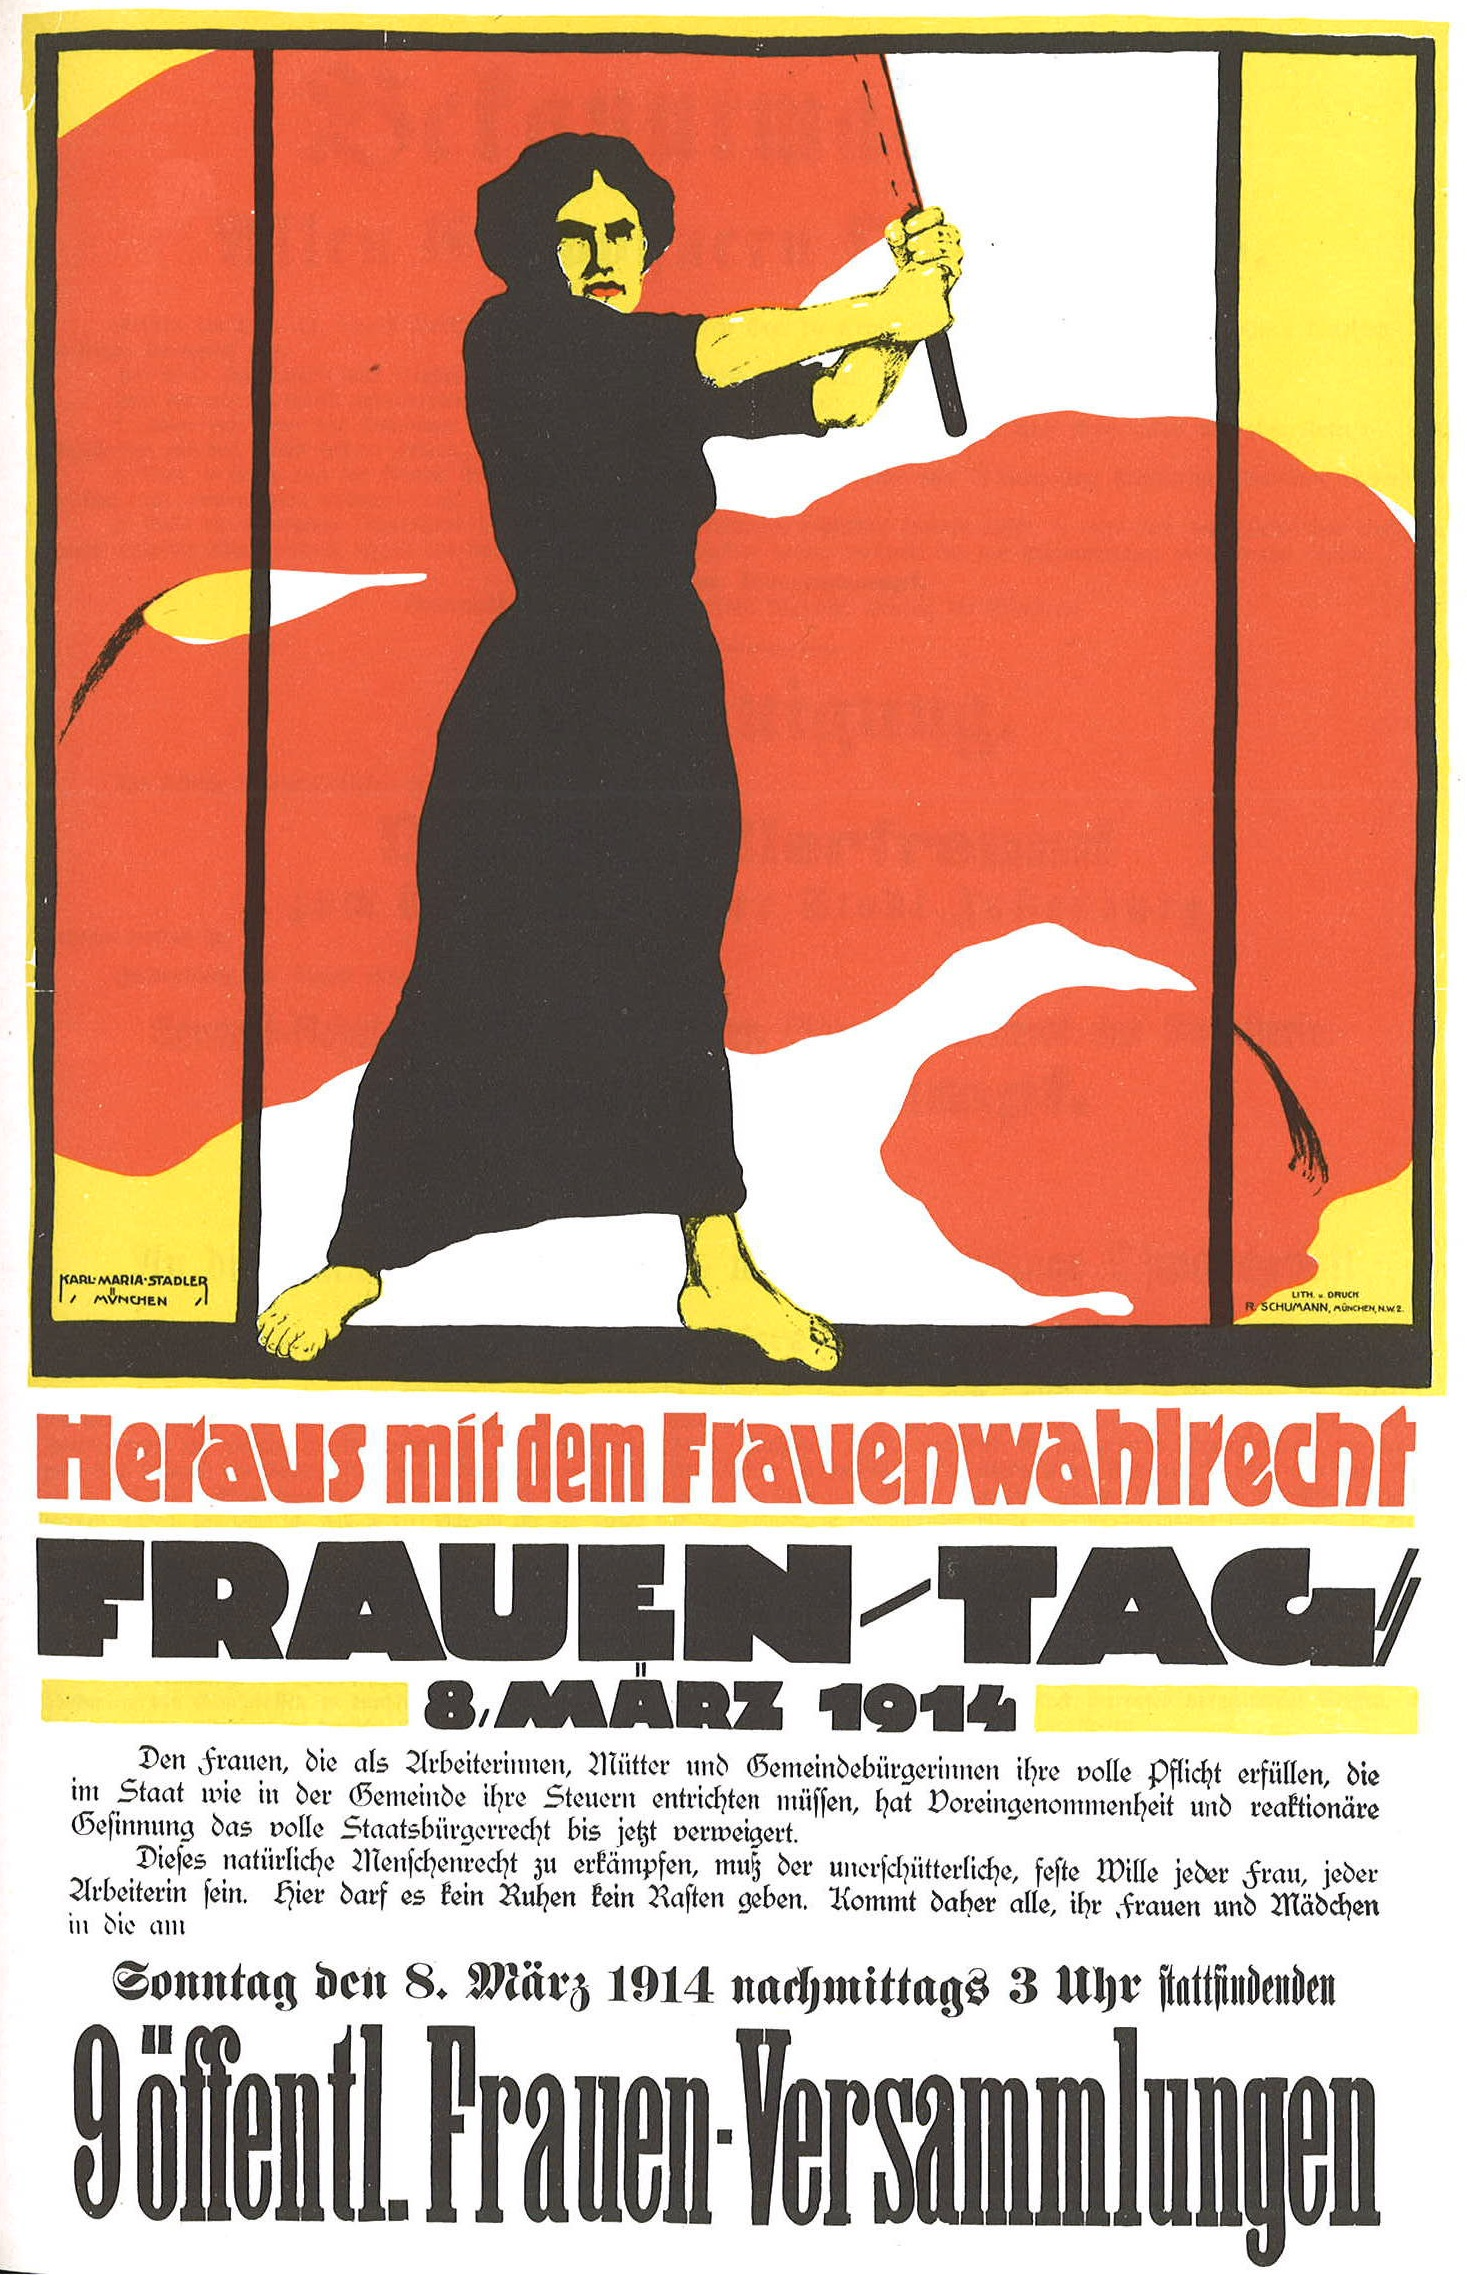 Frauentag_1914-German poster